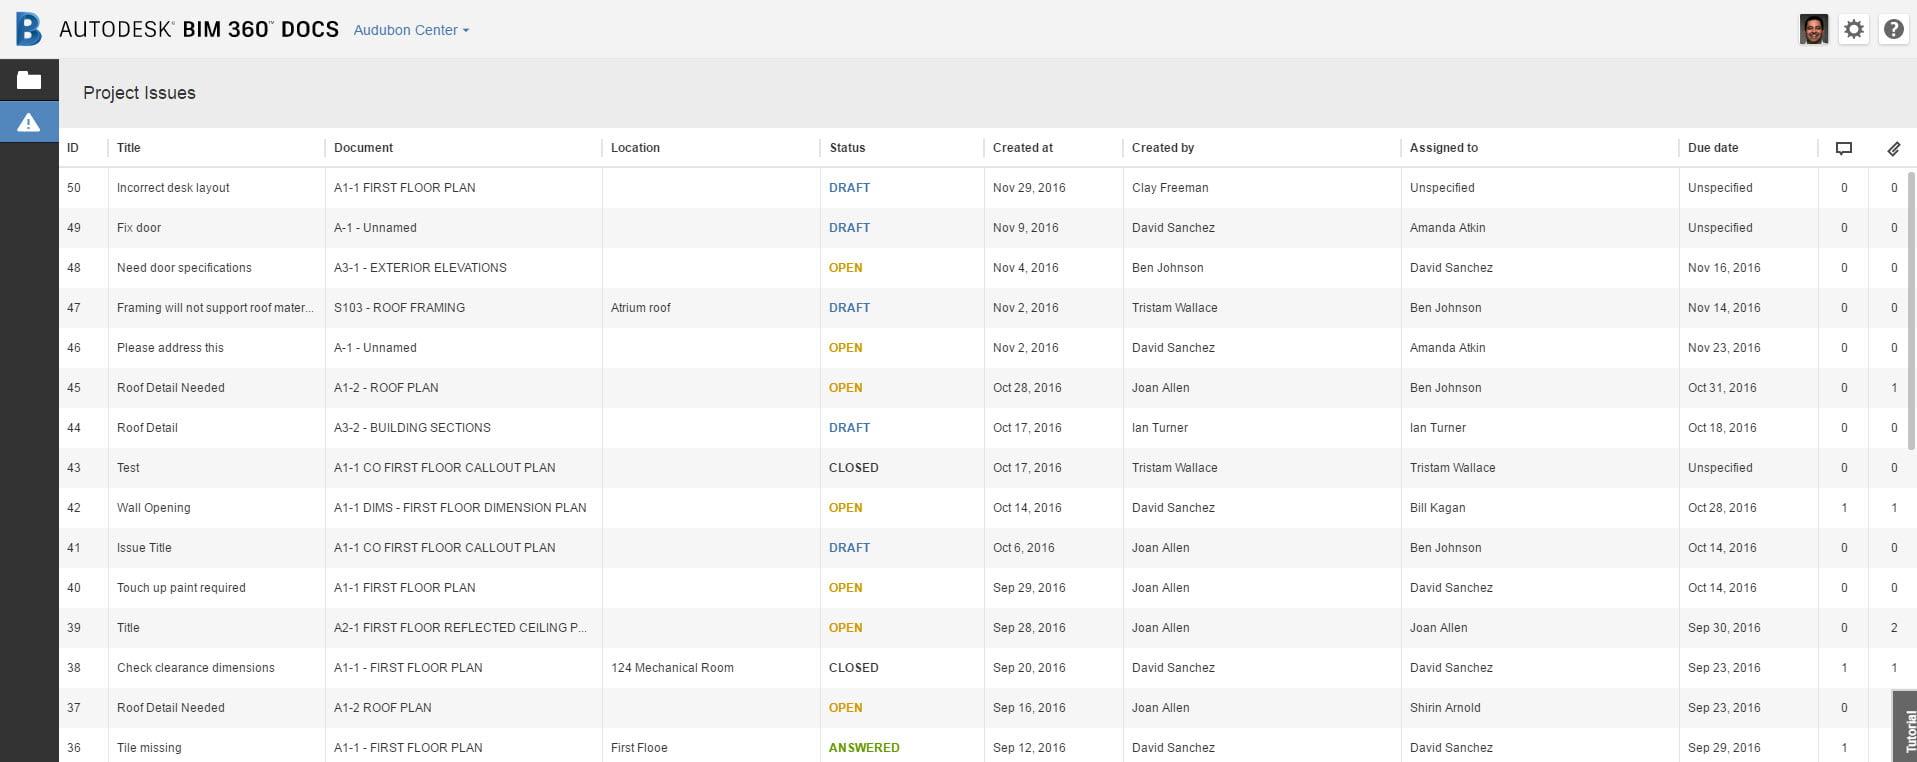 Autodesk BIM 360 Docs Project Issues